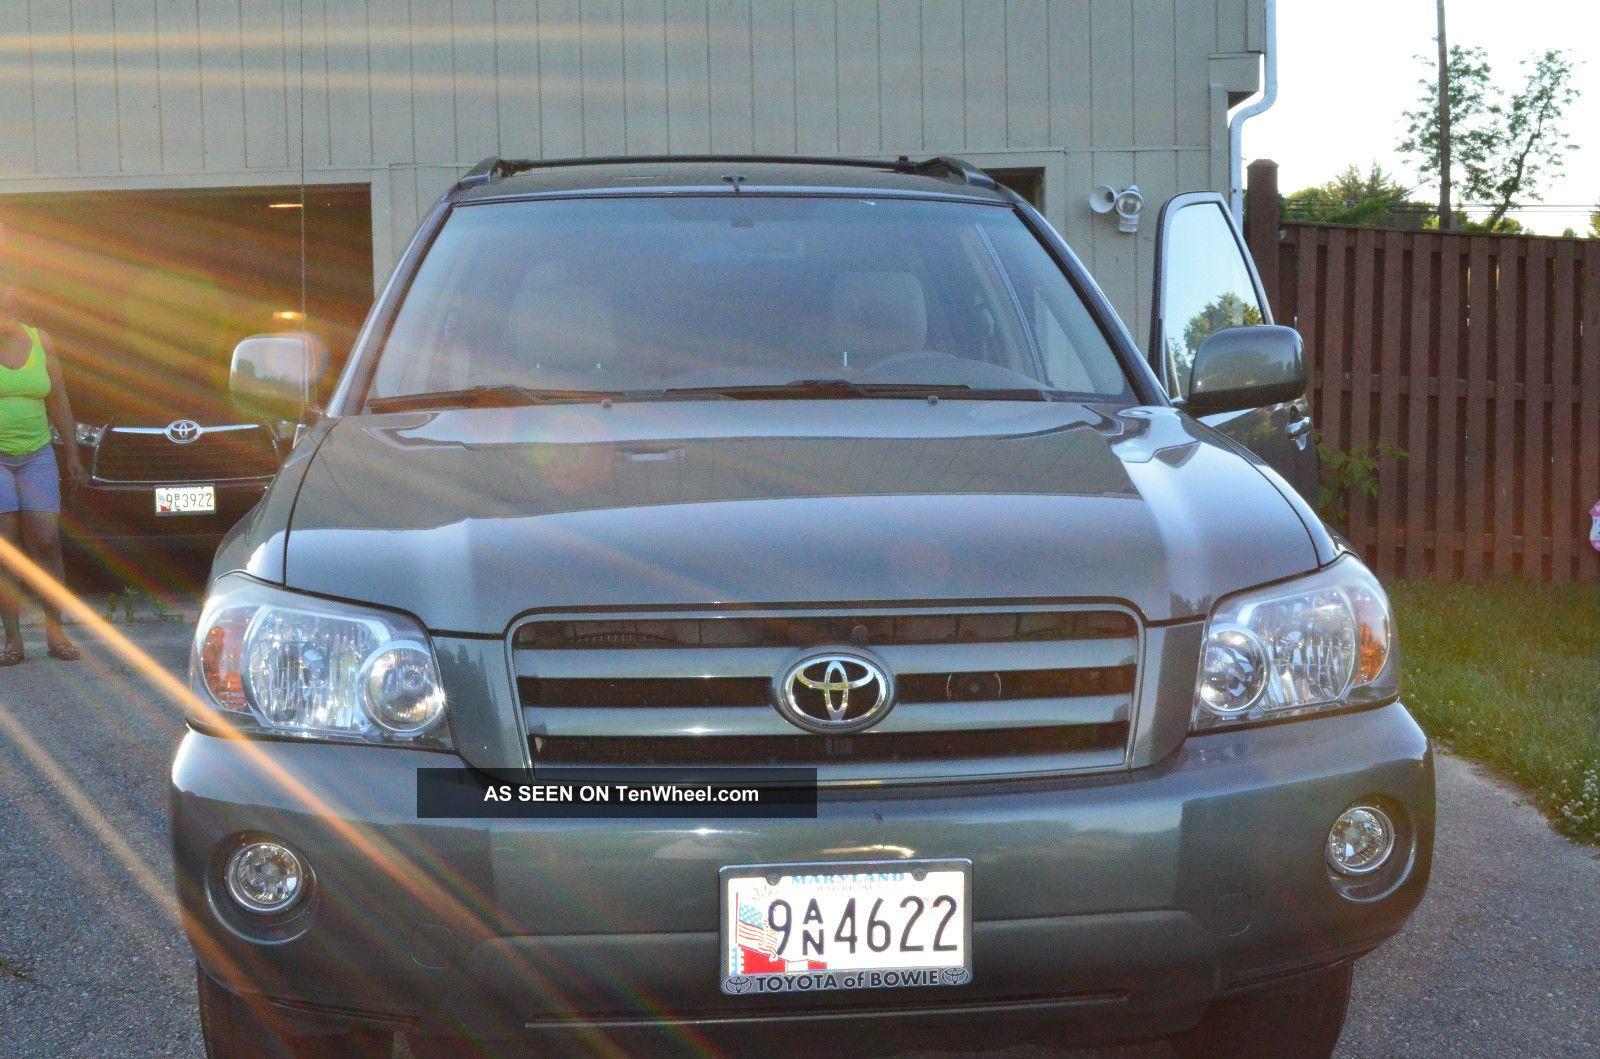 2006 Toyota Highlander,  Green,  4 Door Awd Highlander photo